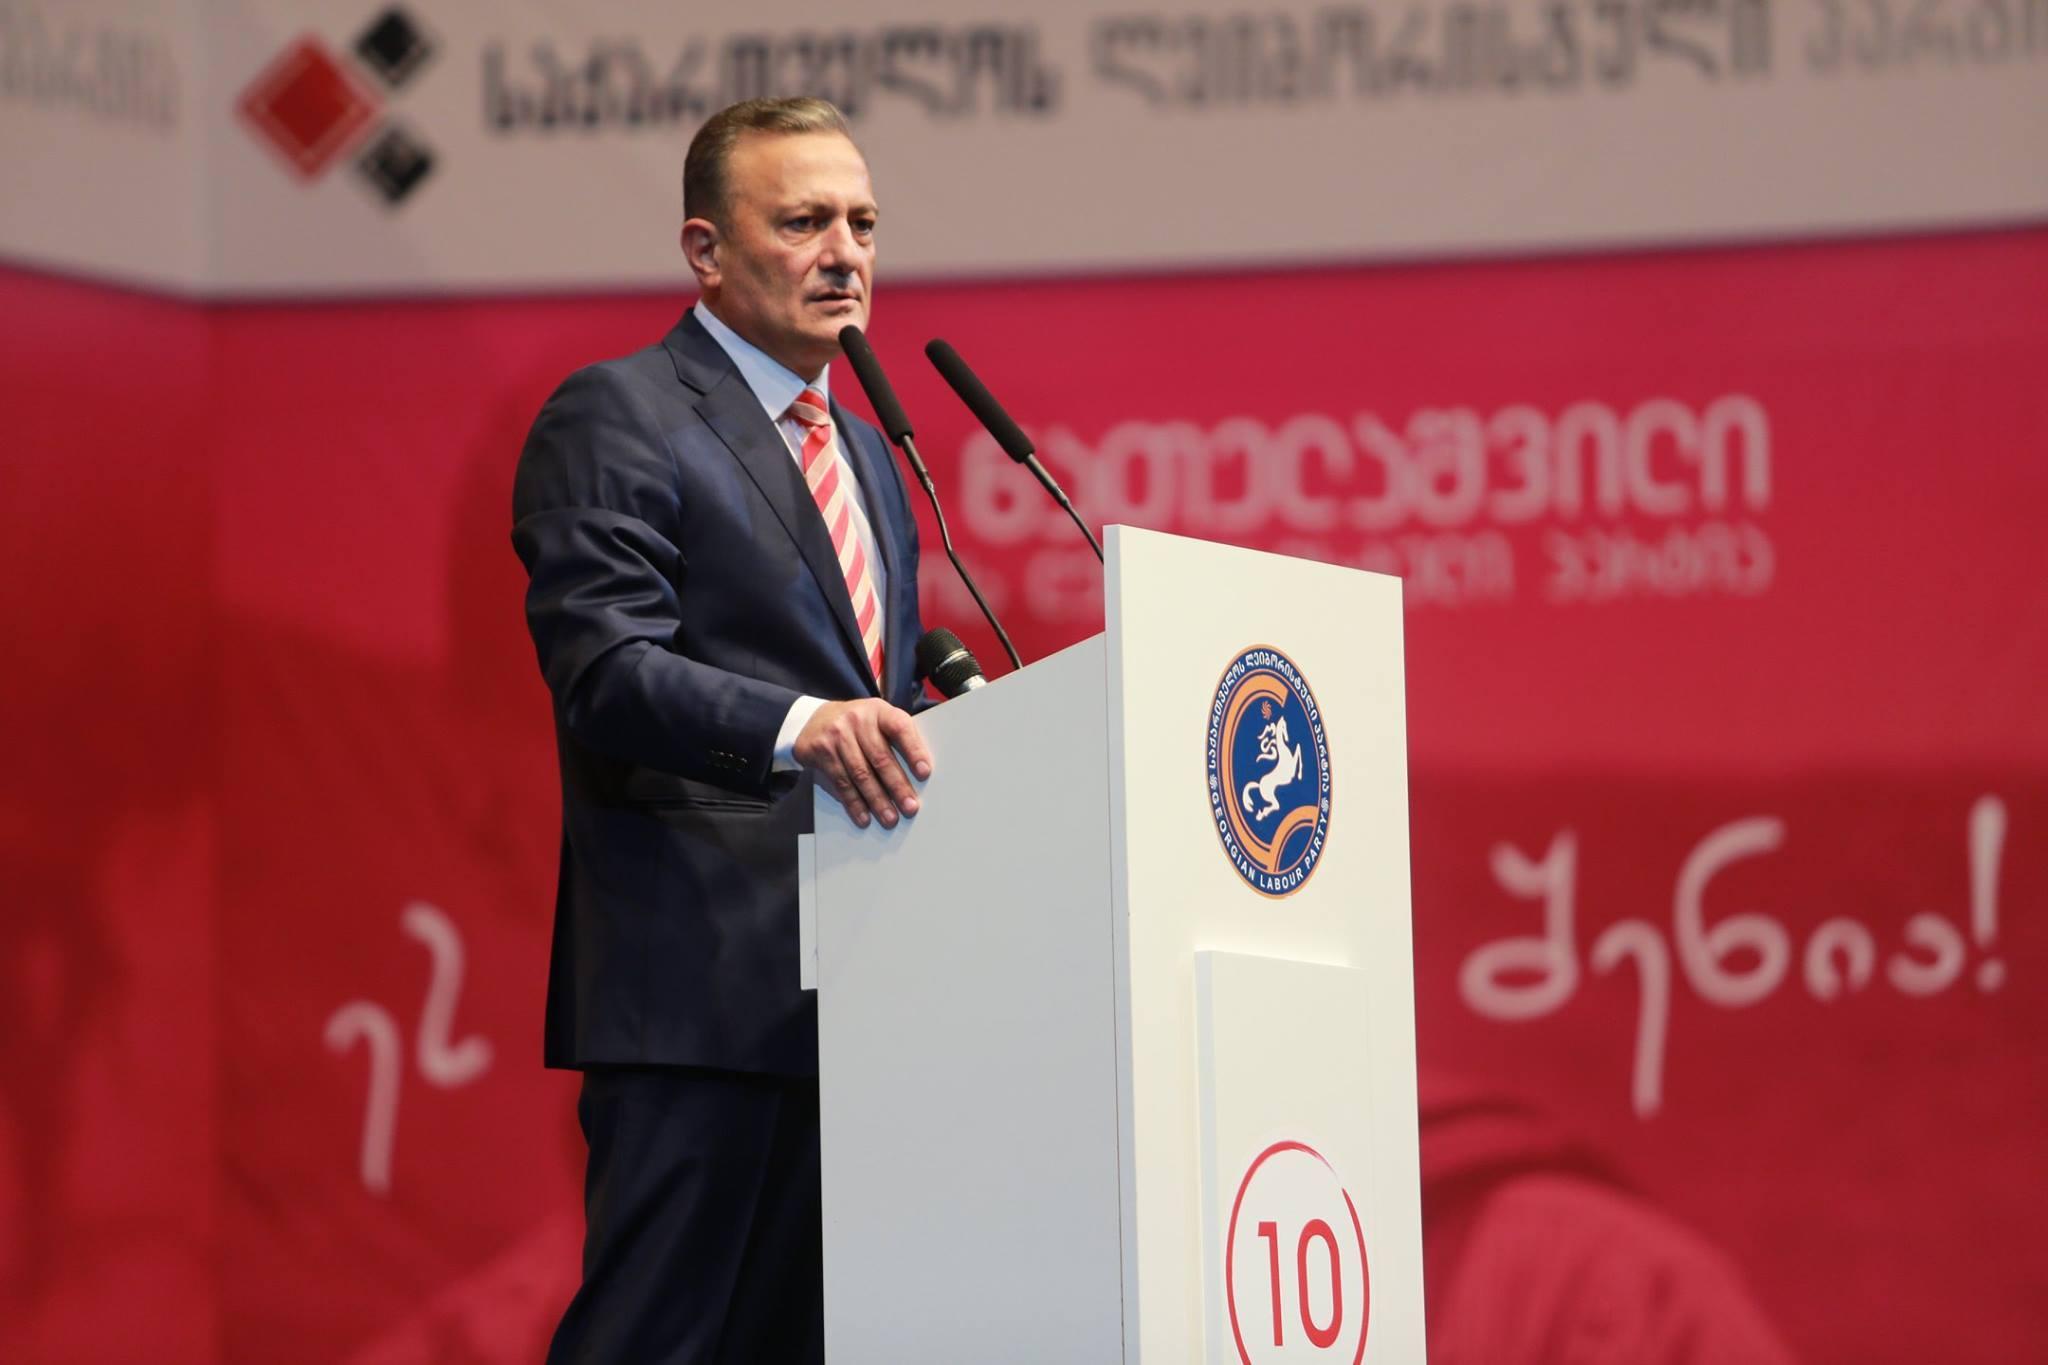 Shalva Natelashvili 1 #новости Бидзина Иванишвили, Грузия, Лейбористская партия, олигархия, оппозиция, Шалва Нателашвили